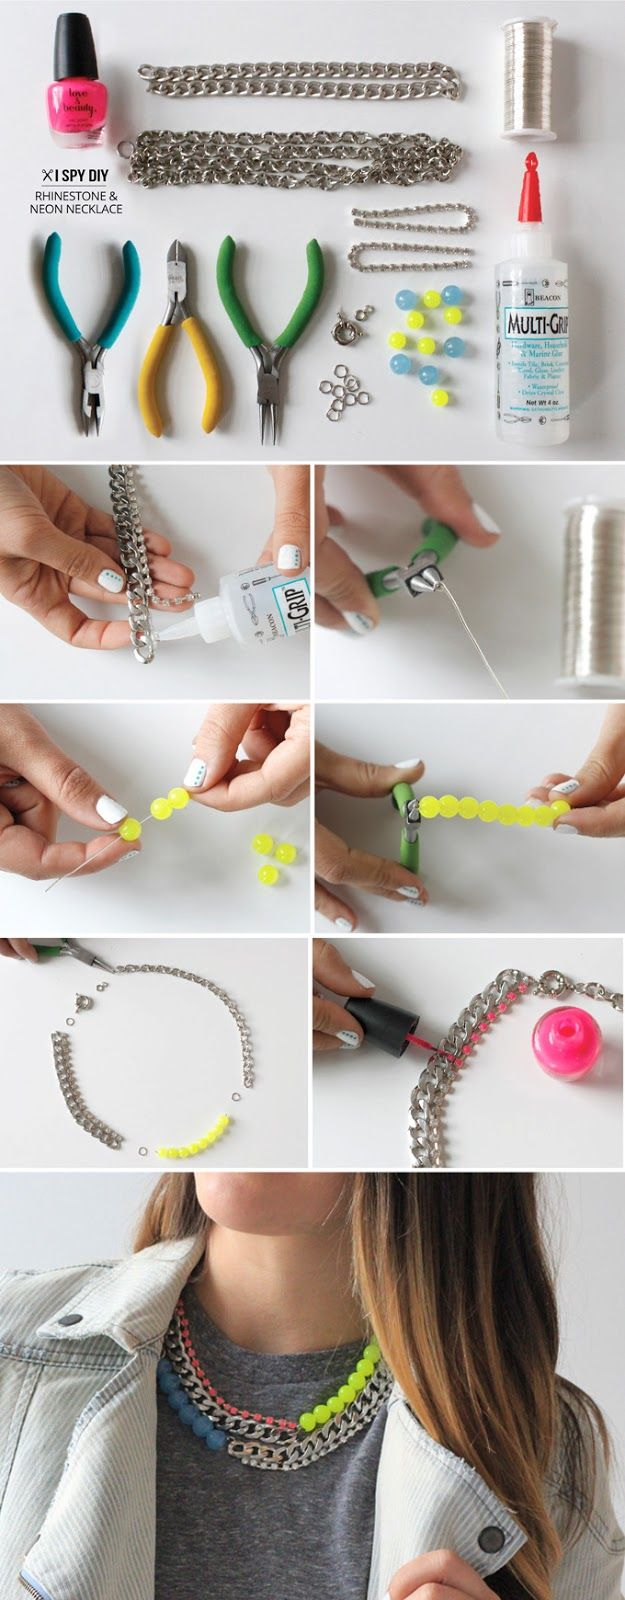 13 Wonderful DIY Jewelry Crafts / Rhinestone Neon Necklace